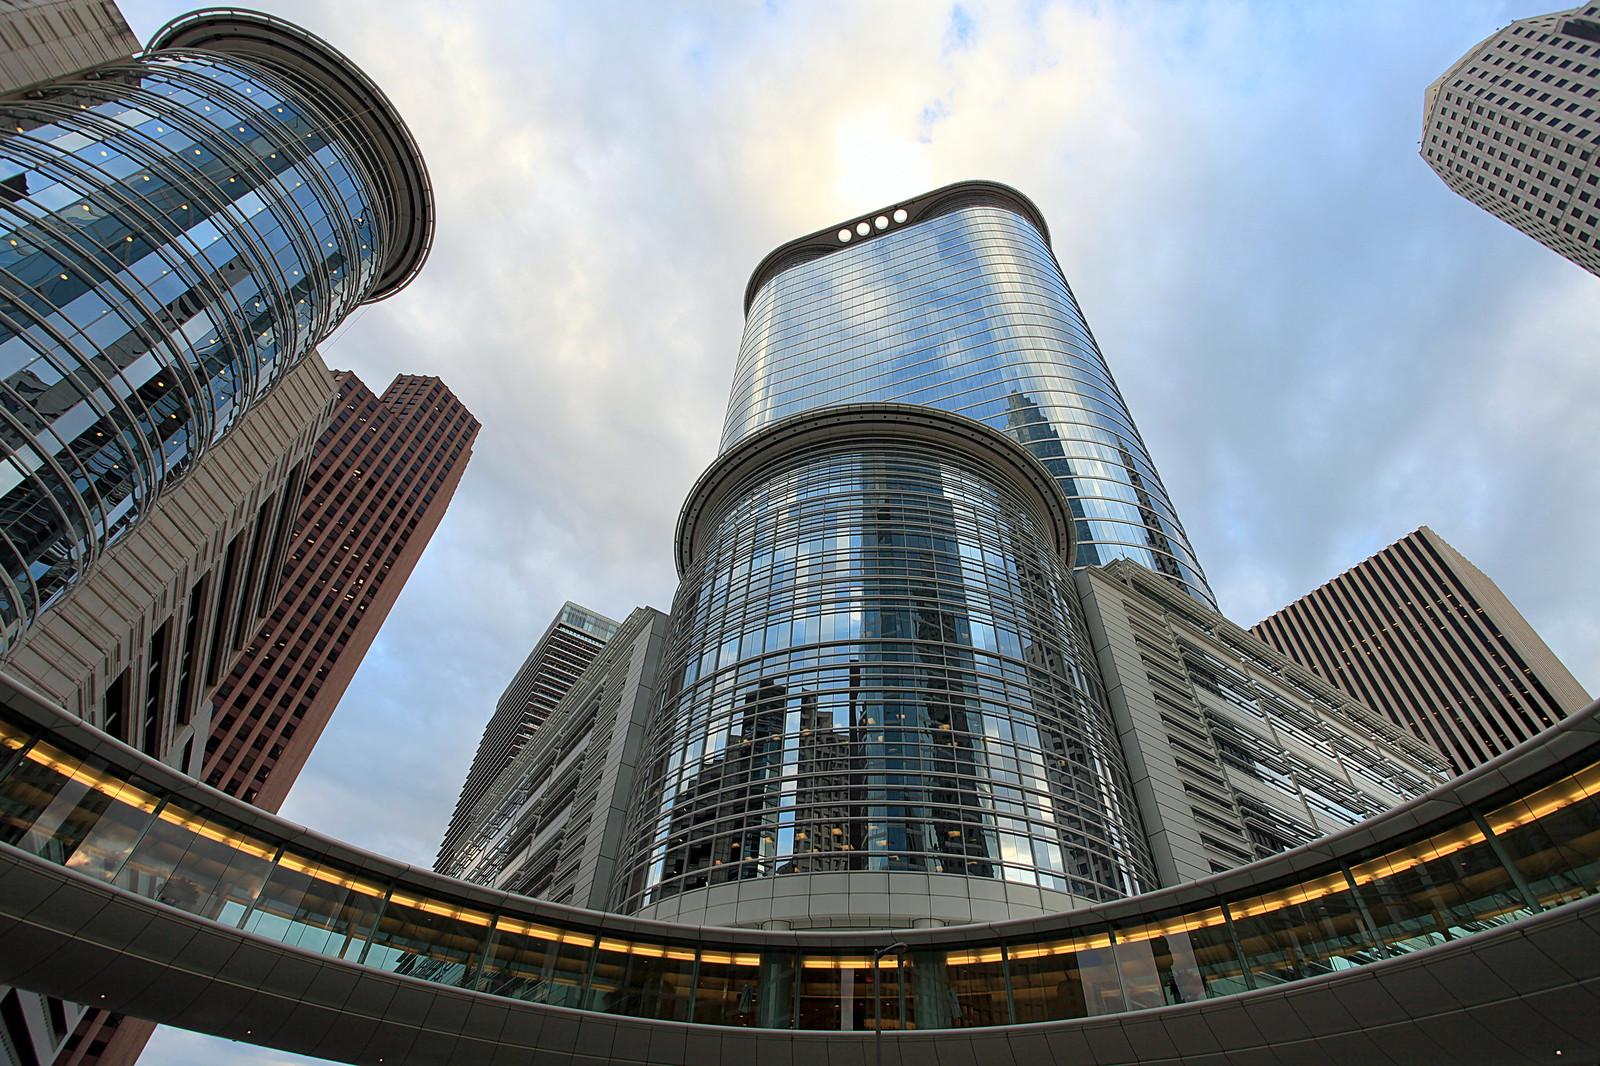 Chevron Towers